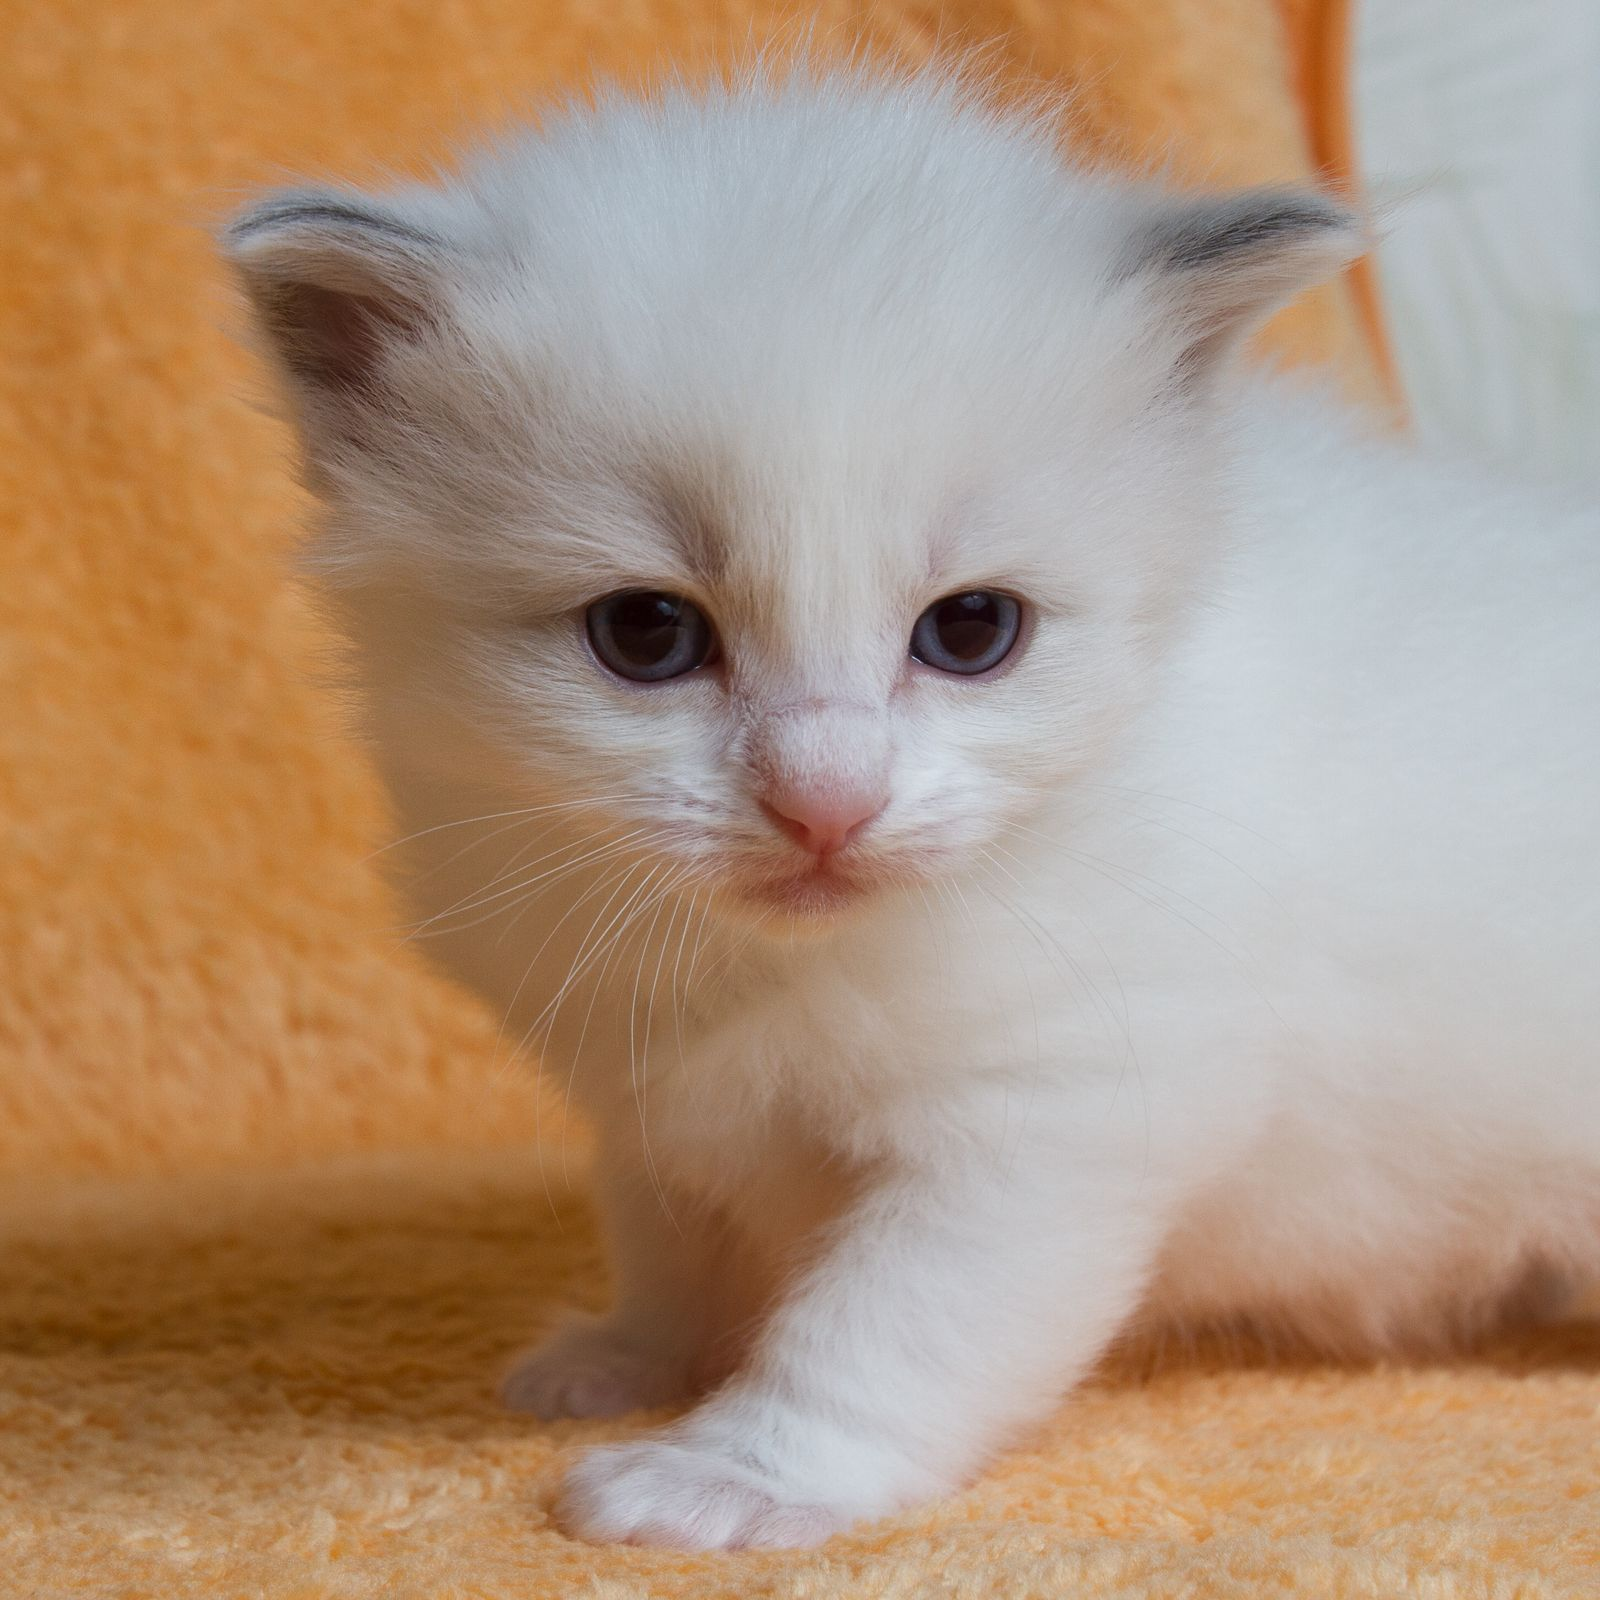 2013 Tsu Tey A Zwollywood Cat 3 Weeks Old Ragdoll Kitten Blue Bicolour Avatar Litter Pretty Cats Funny Cat Faces Dog Cat